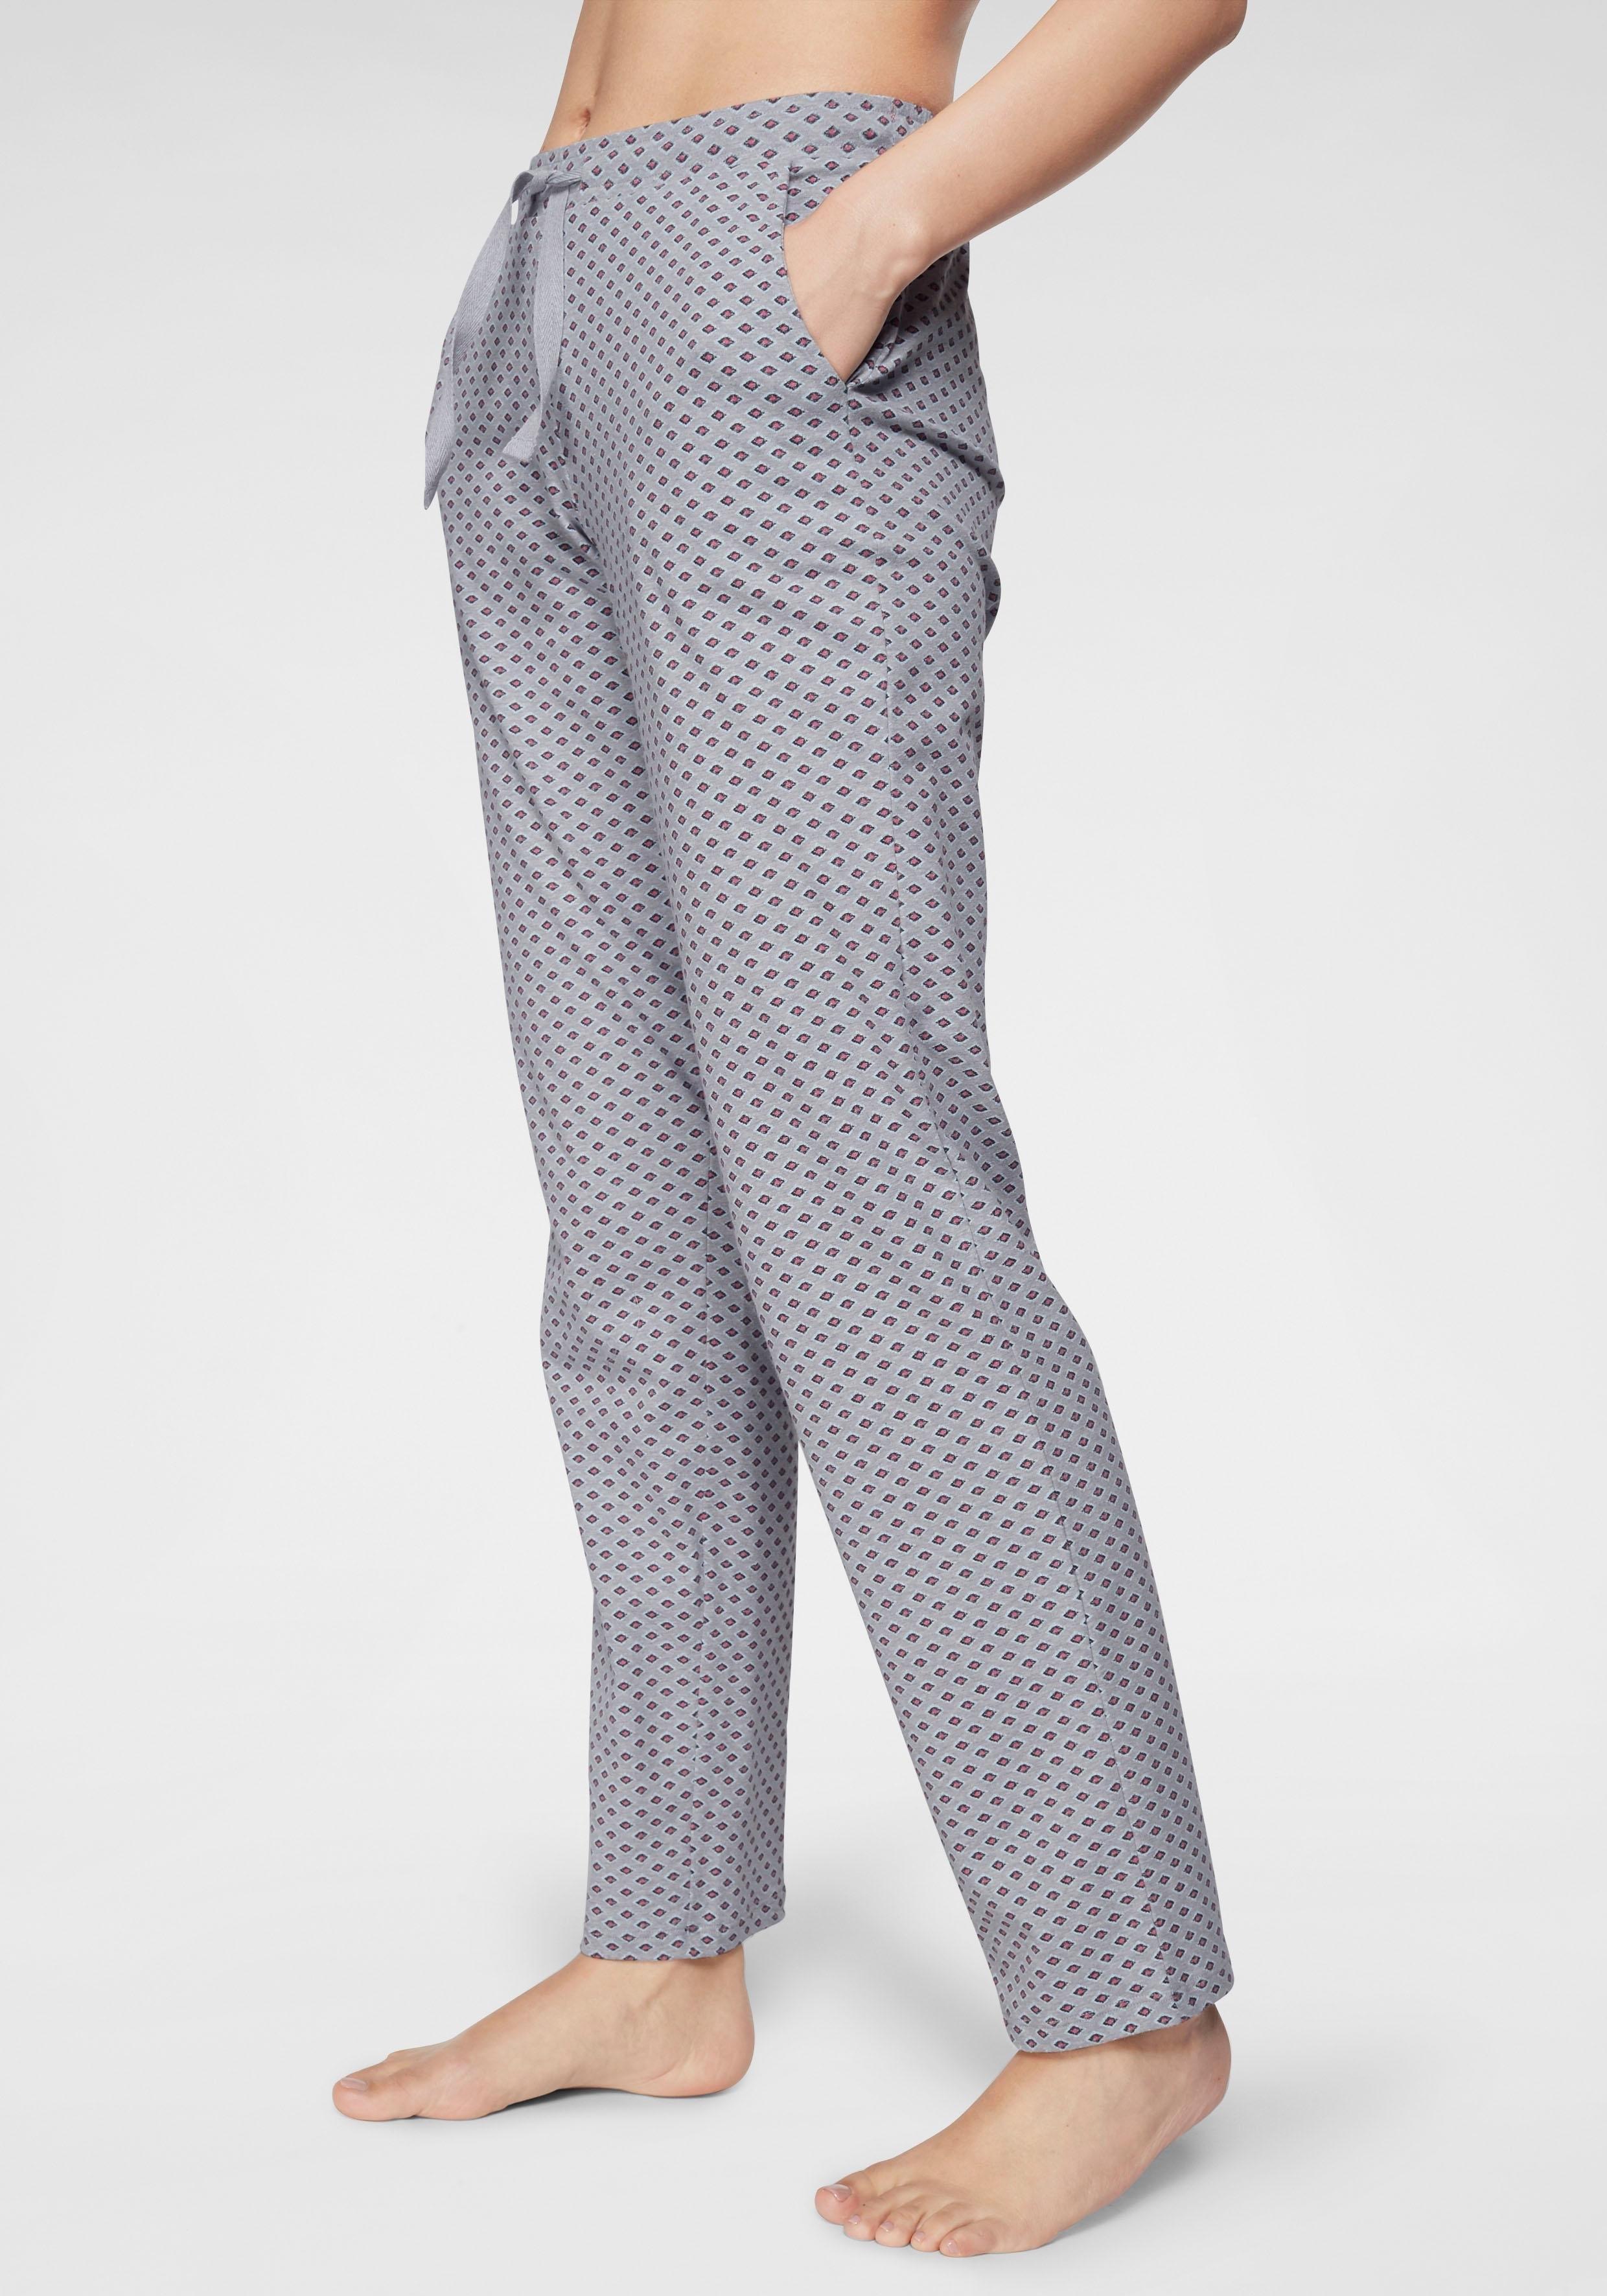 Schiesser pyjamabroek - verschillende betaalmethodes